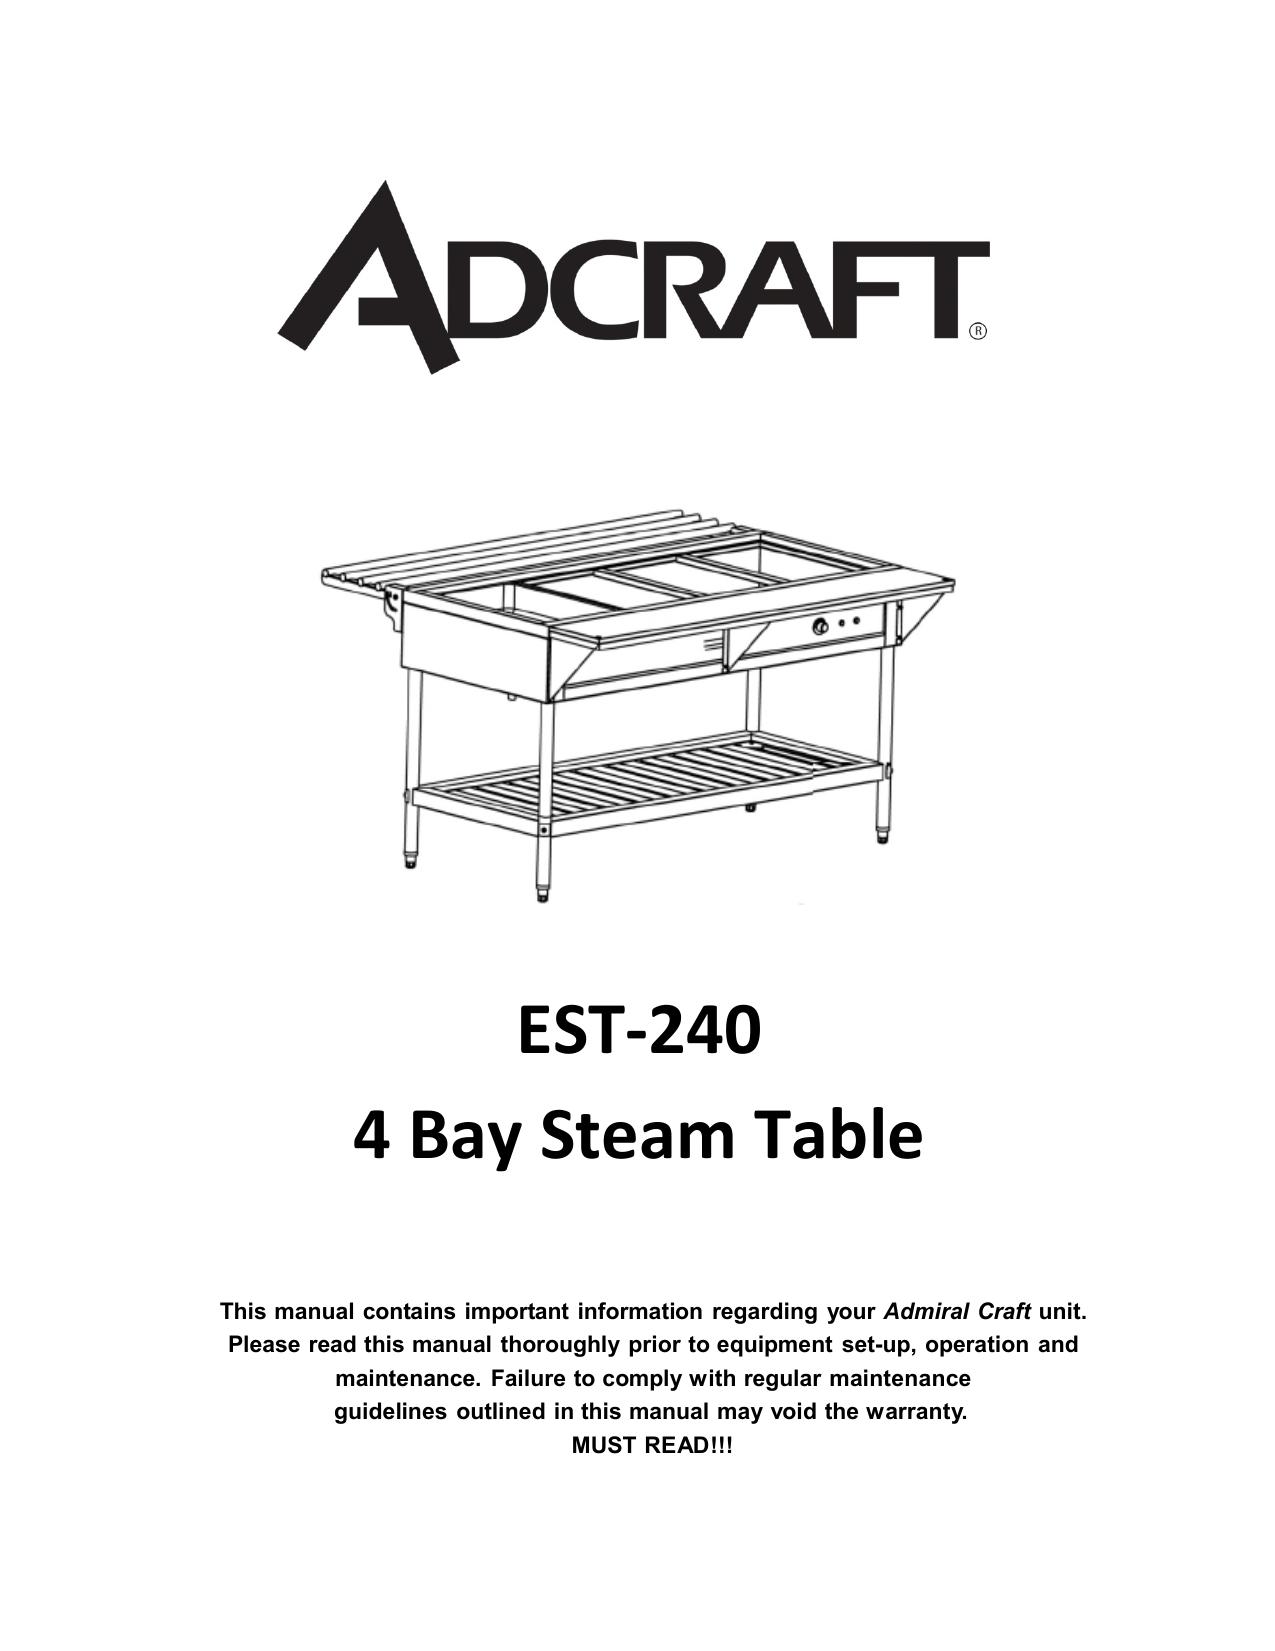 Adcraft EST-240 Water Bath Steam Table